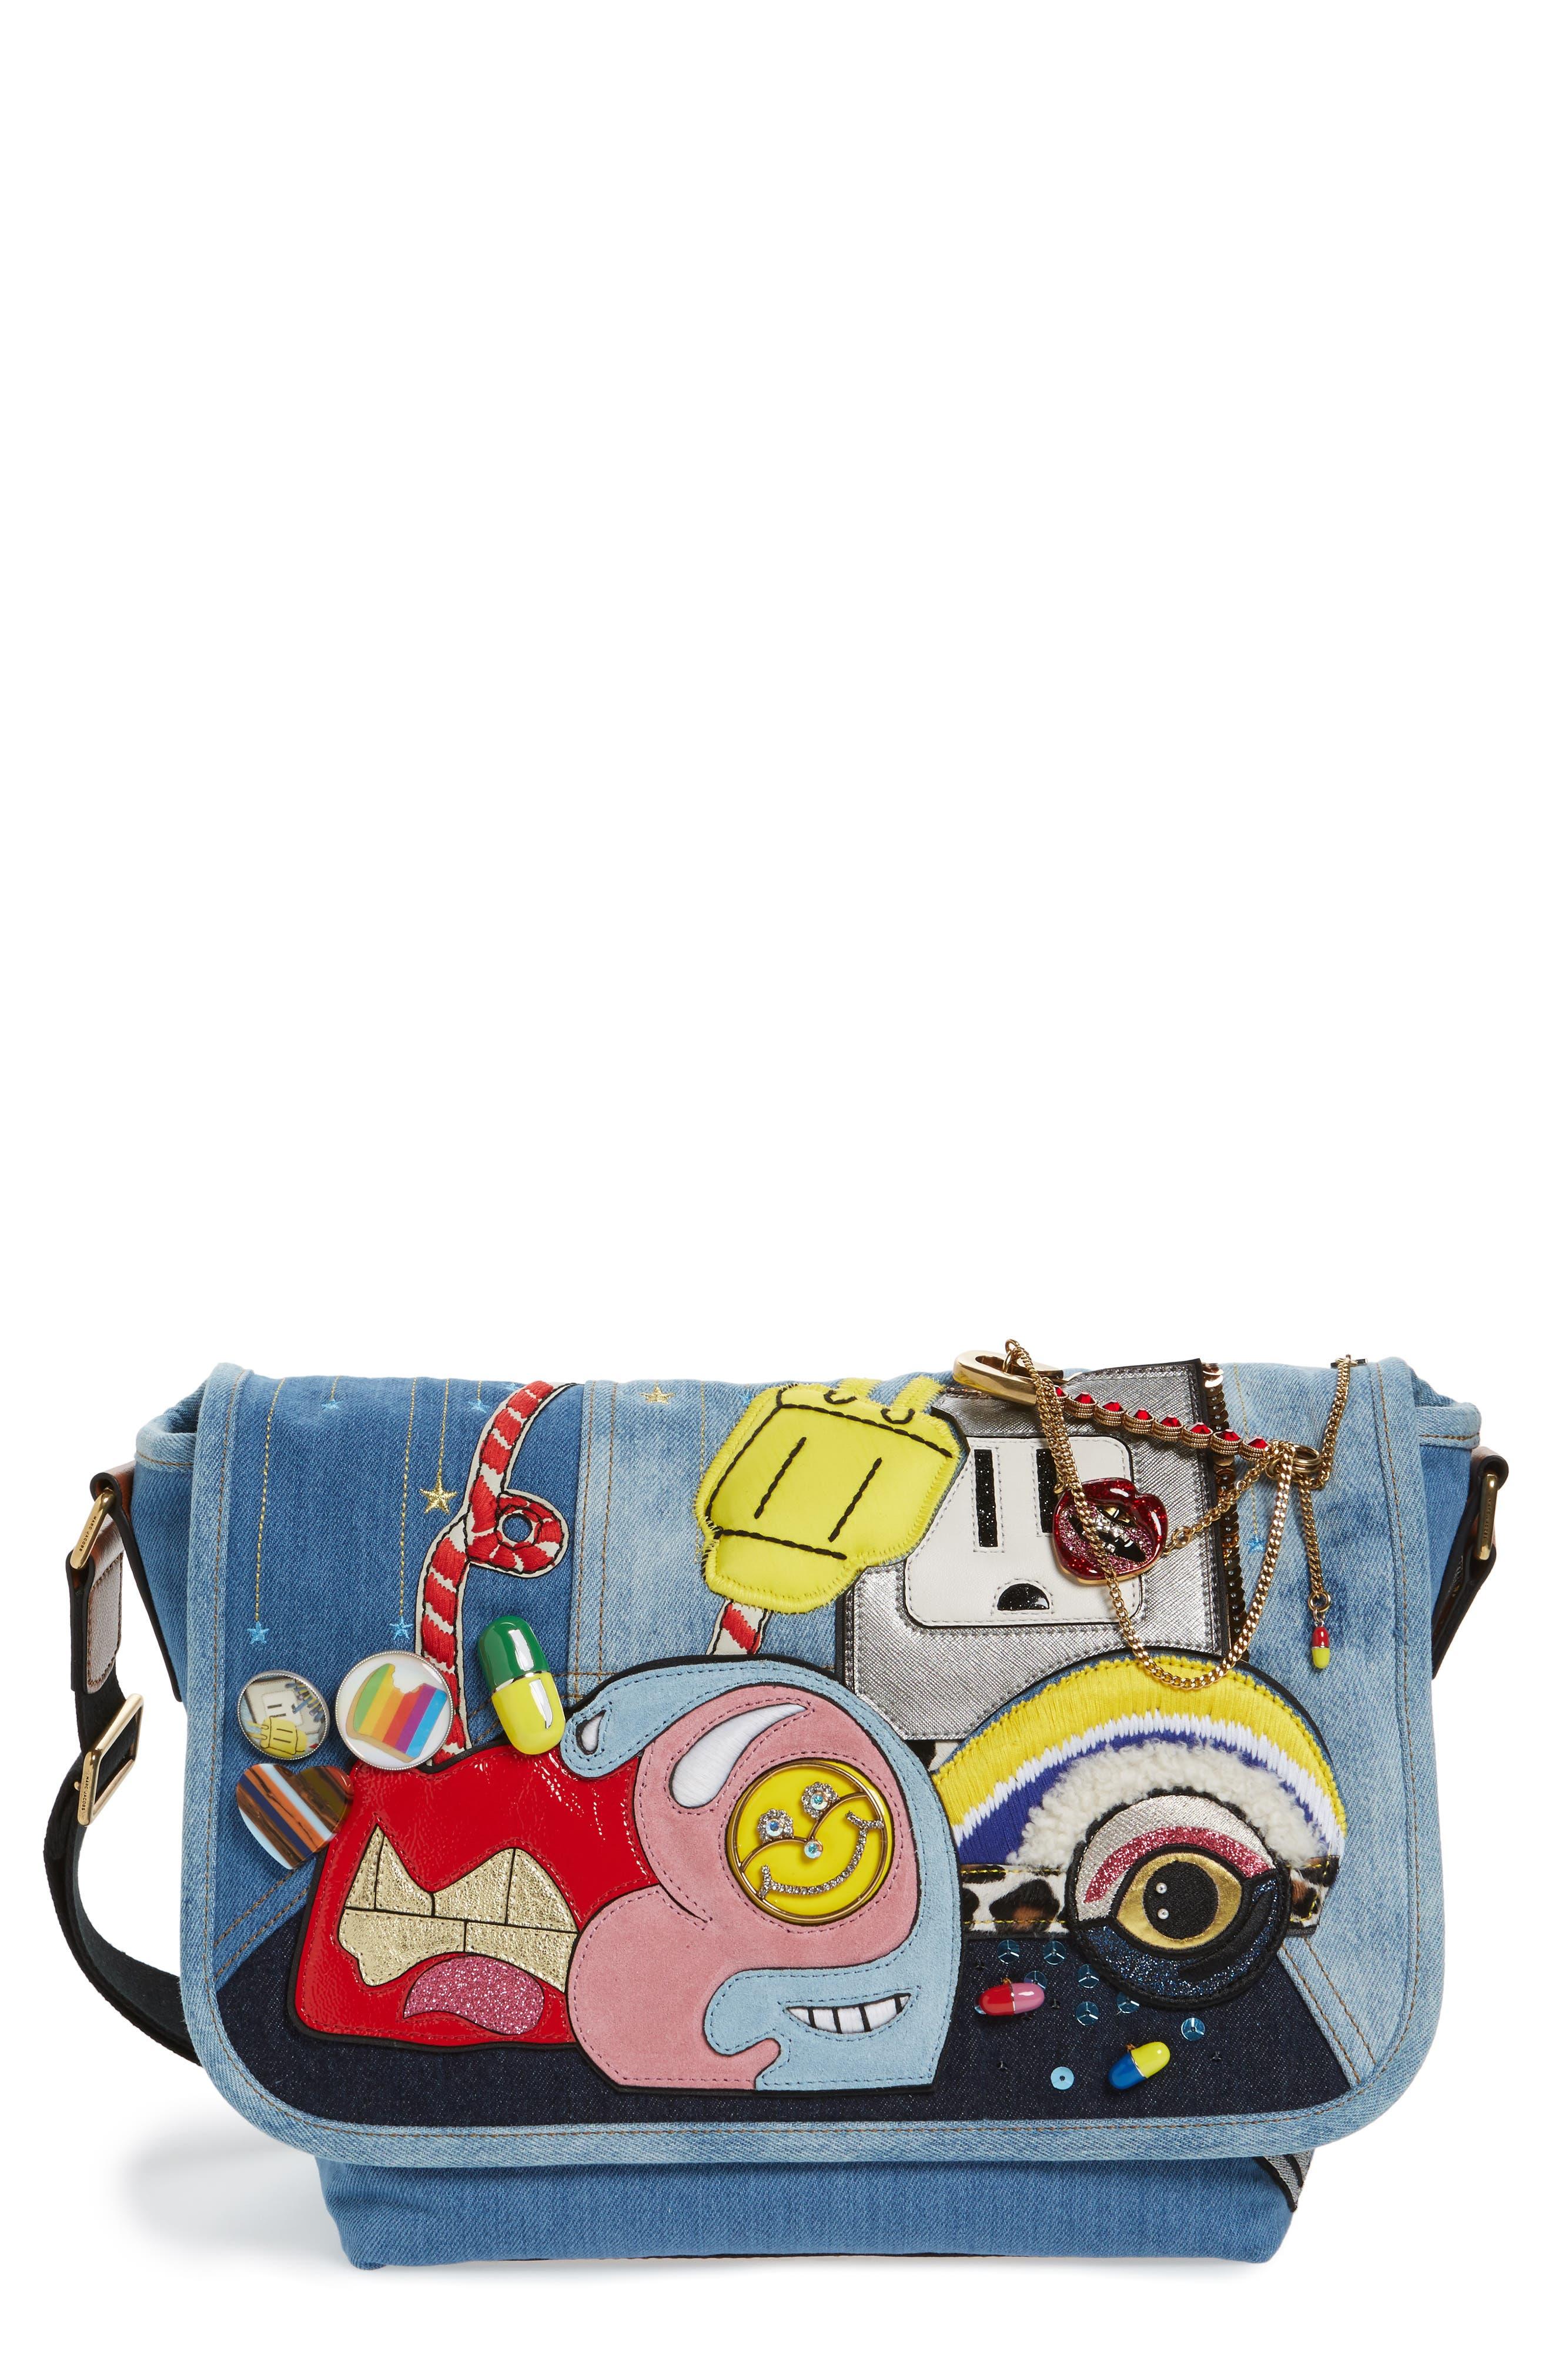 Alternate Image 1 Selected - MARC JACOBS Denim Crossbody Bag